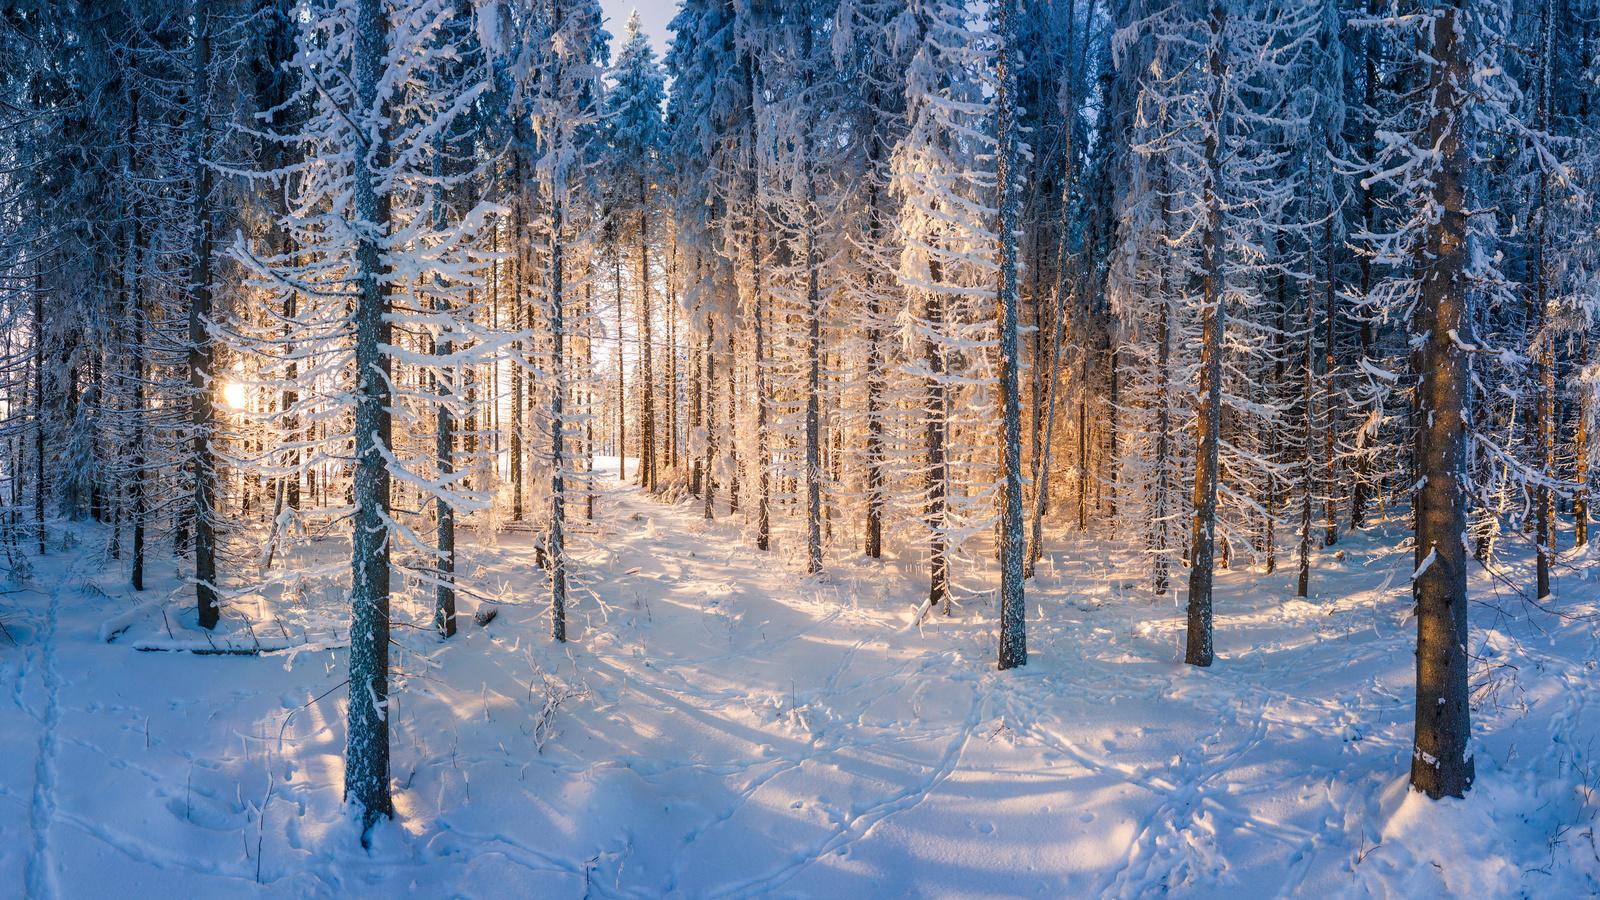 финляндия, лес, зима, снег, природа